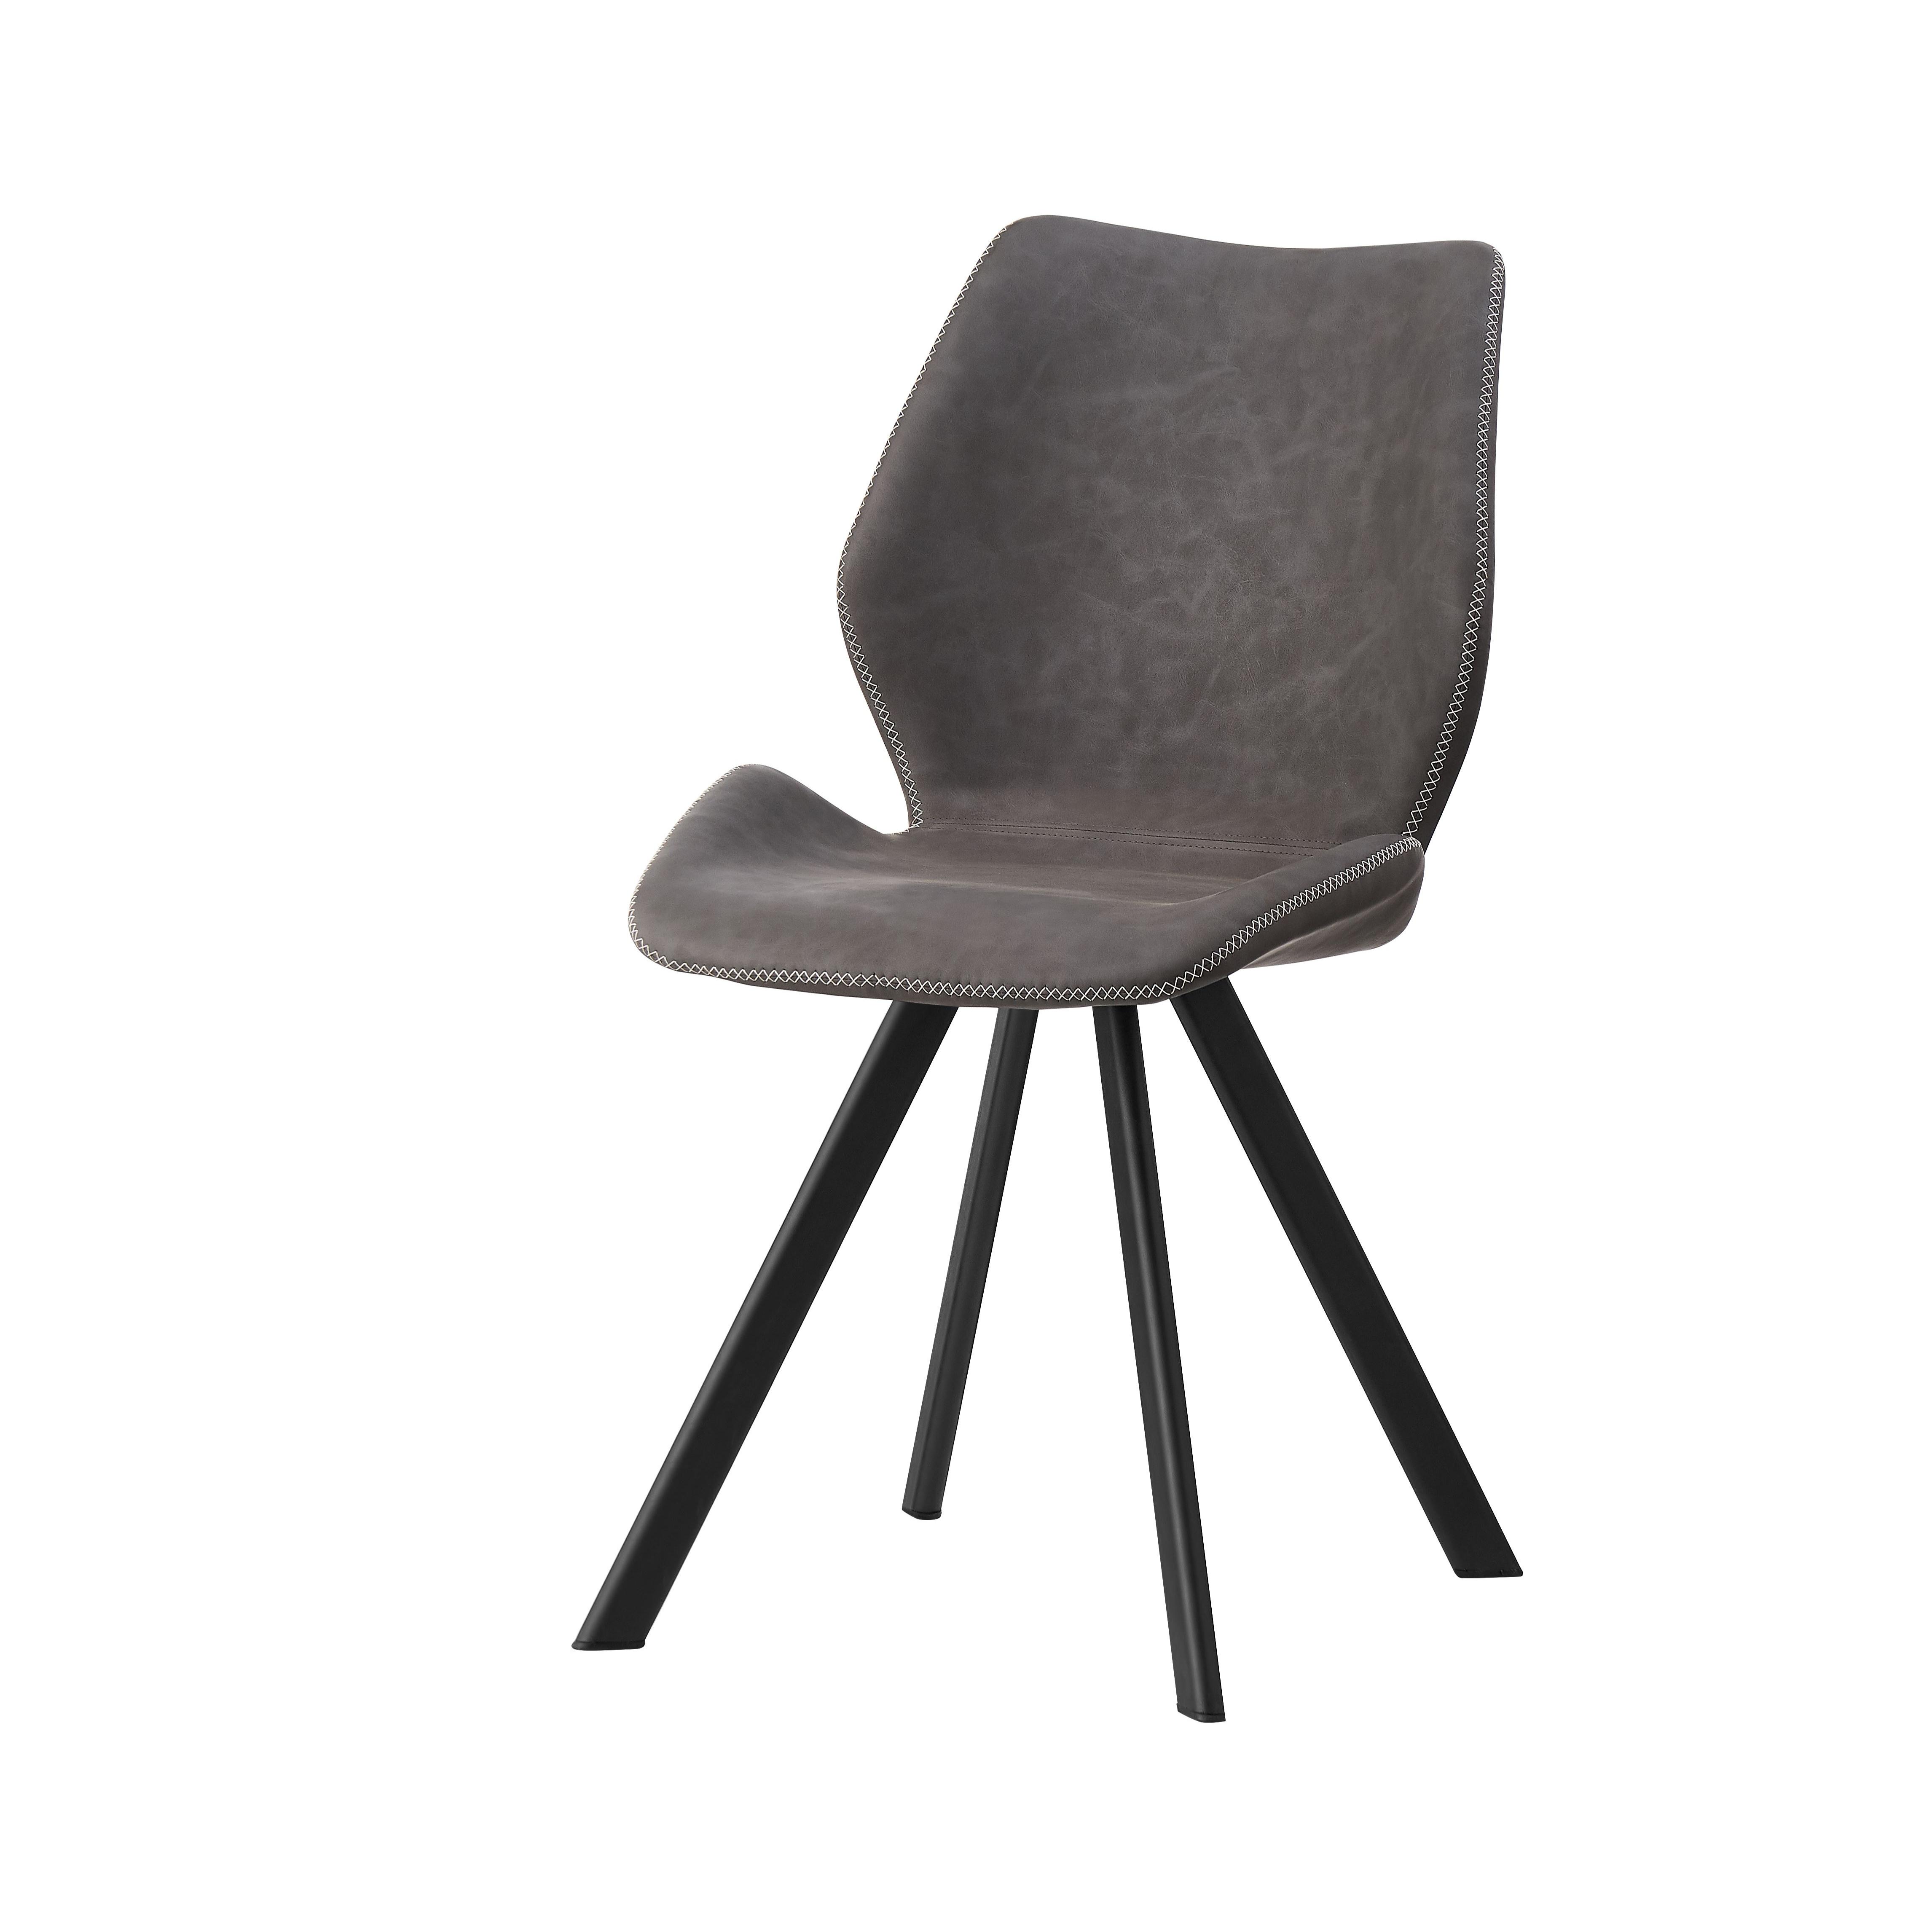 Dining chair Senfan PU modern metal leg comfortable armchair upholstered elegant most popular nordic